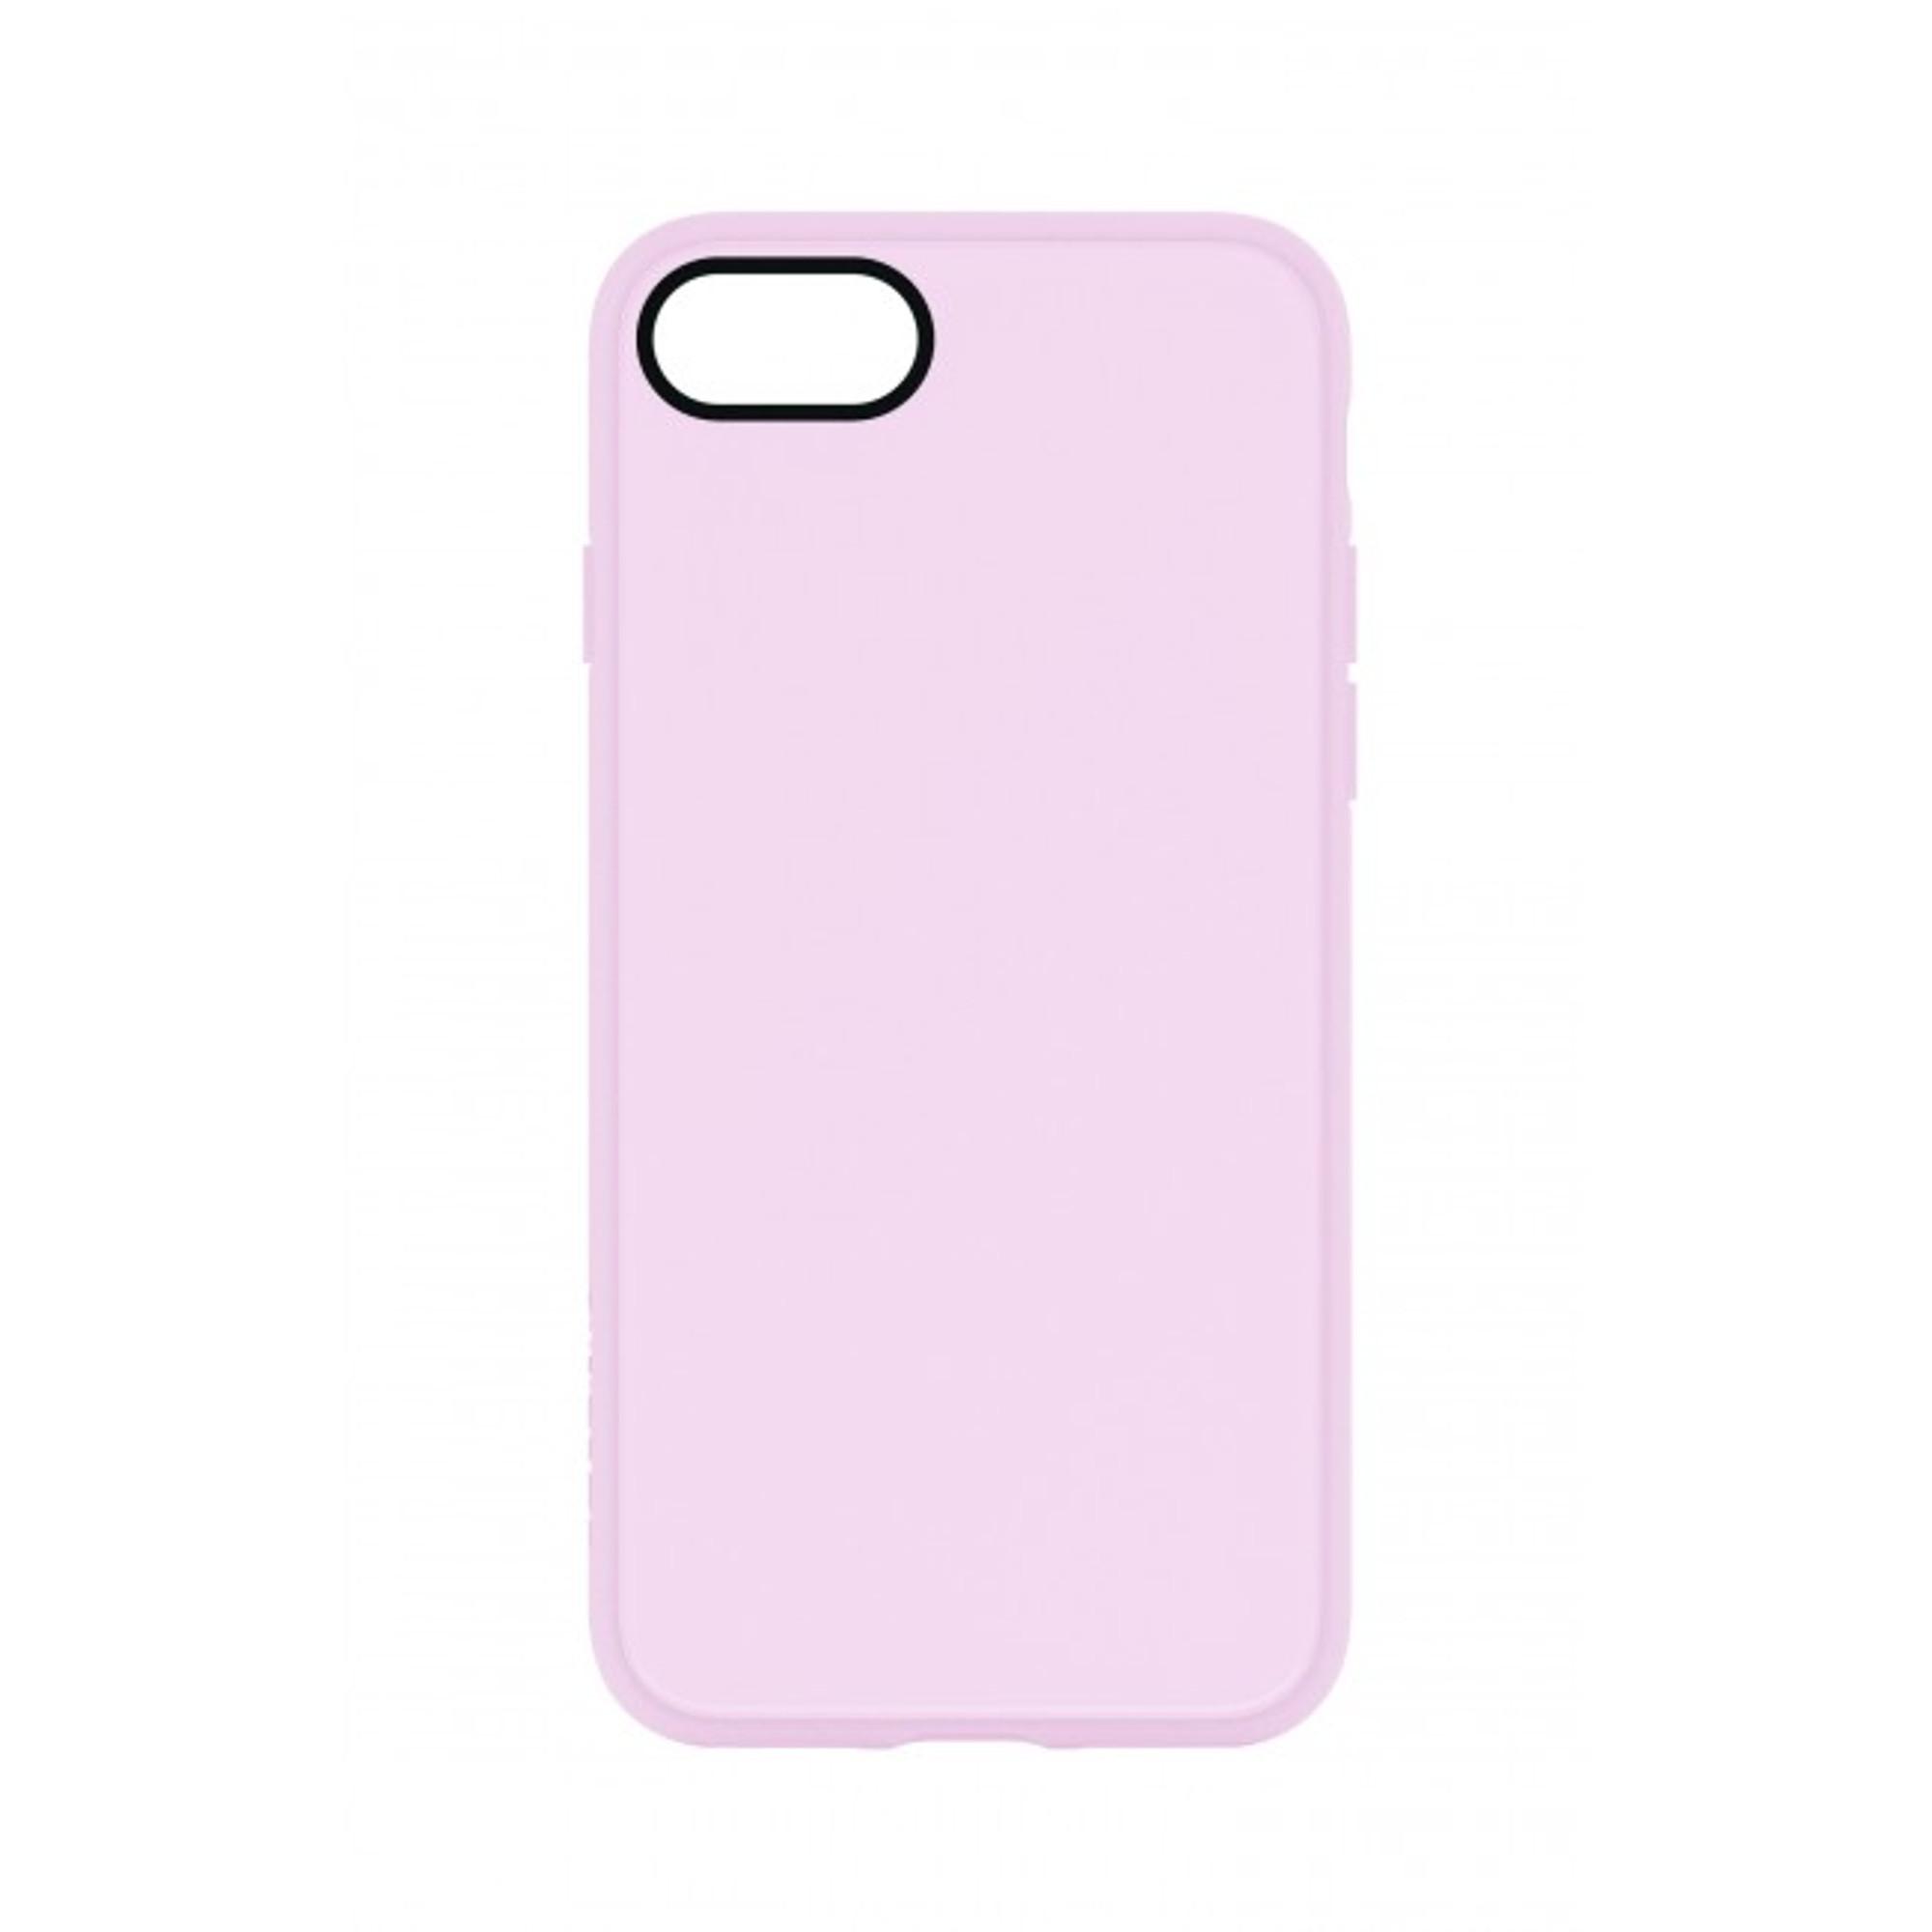 10e520934a6 Incase Pop Case for iPhone 7 - Rose Quartz (INPH170247-RSQ)